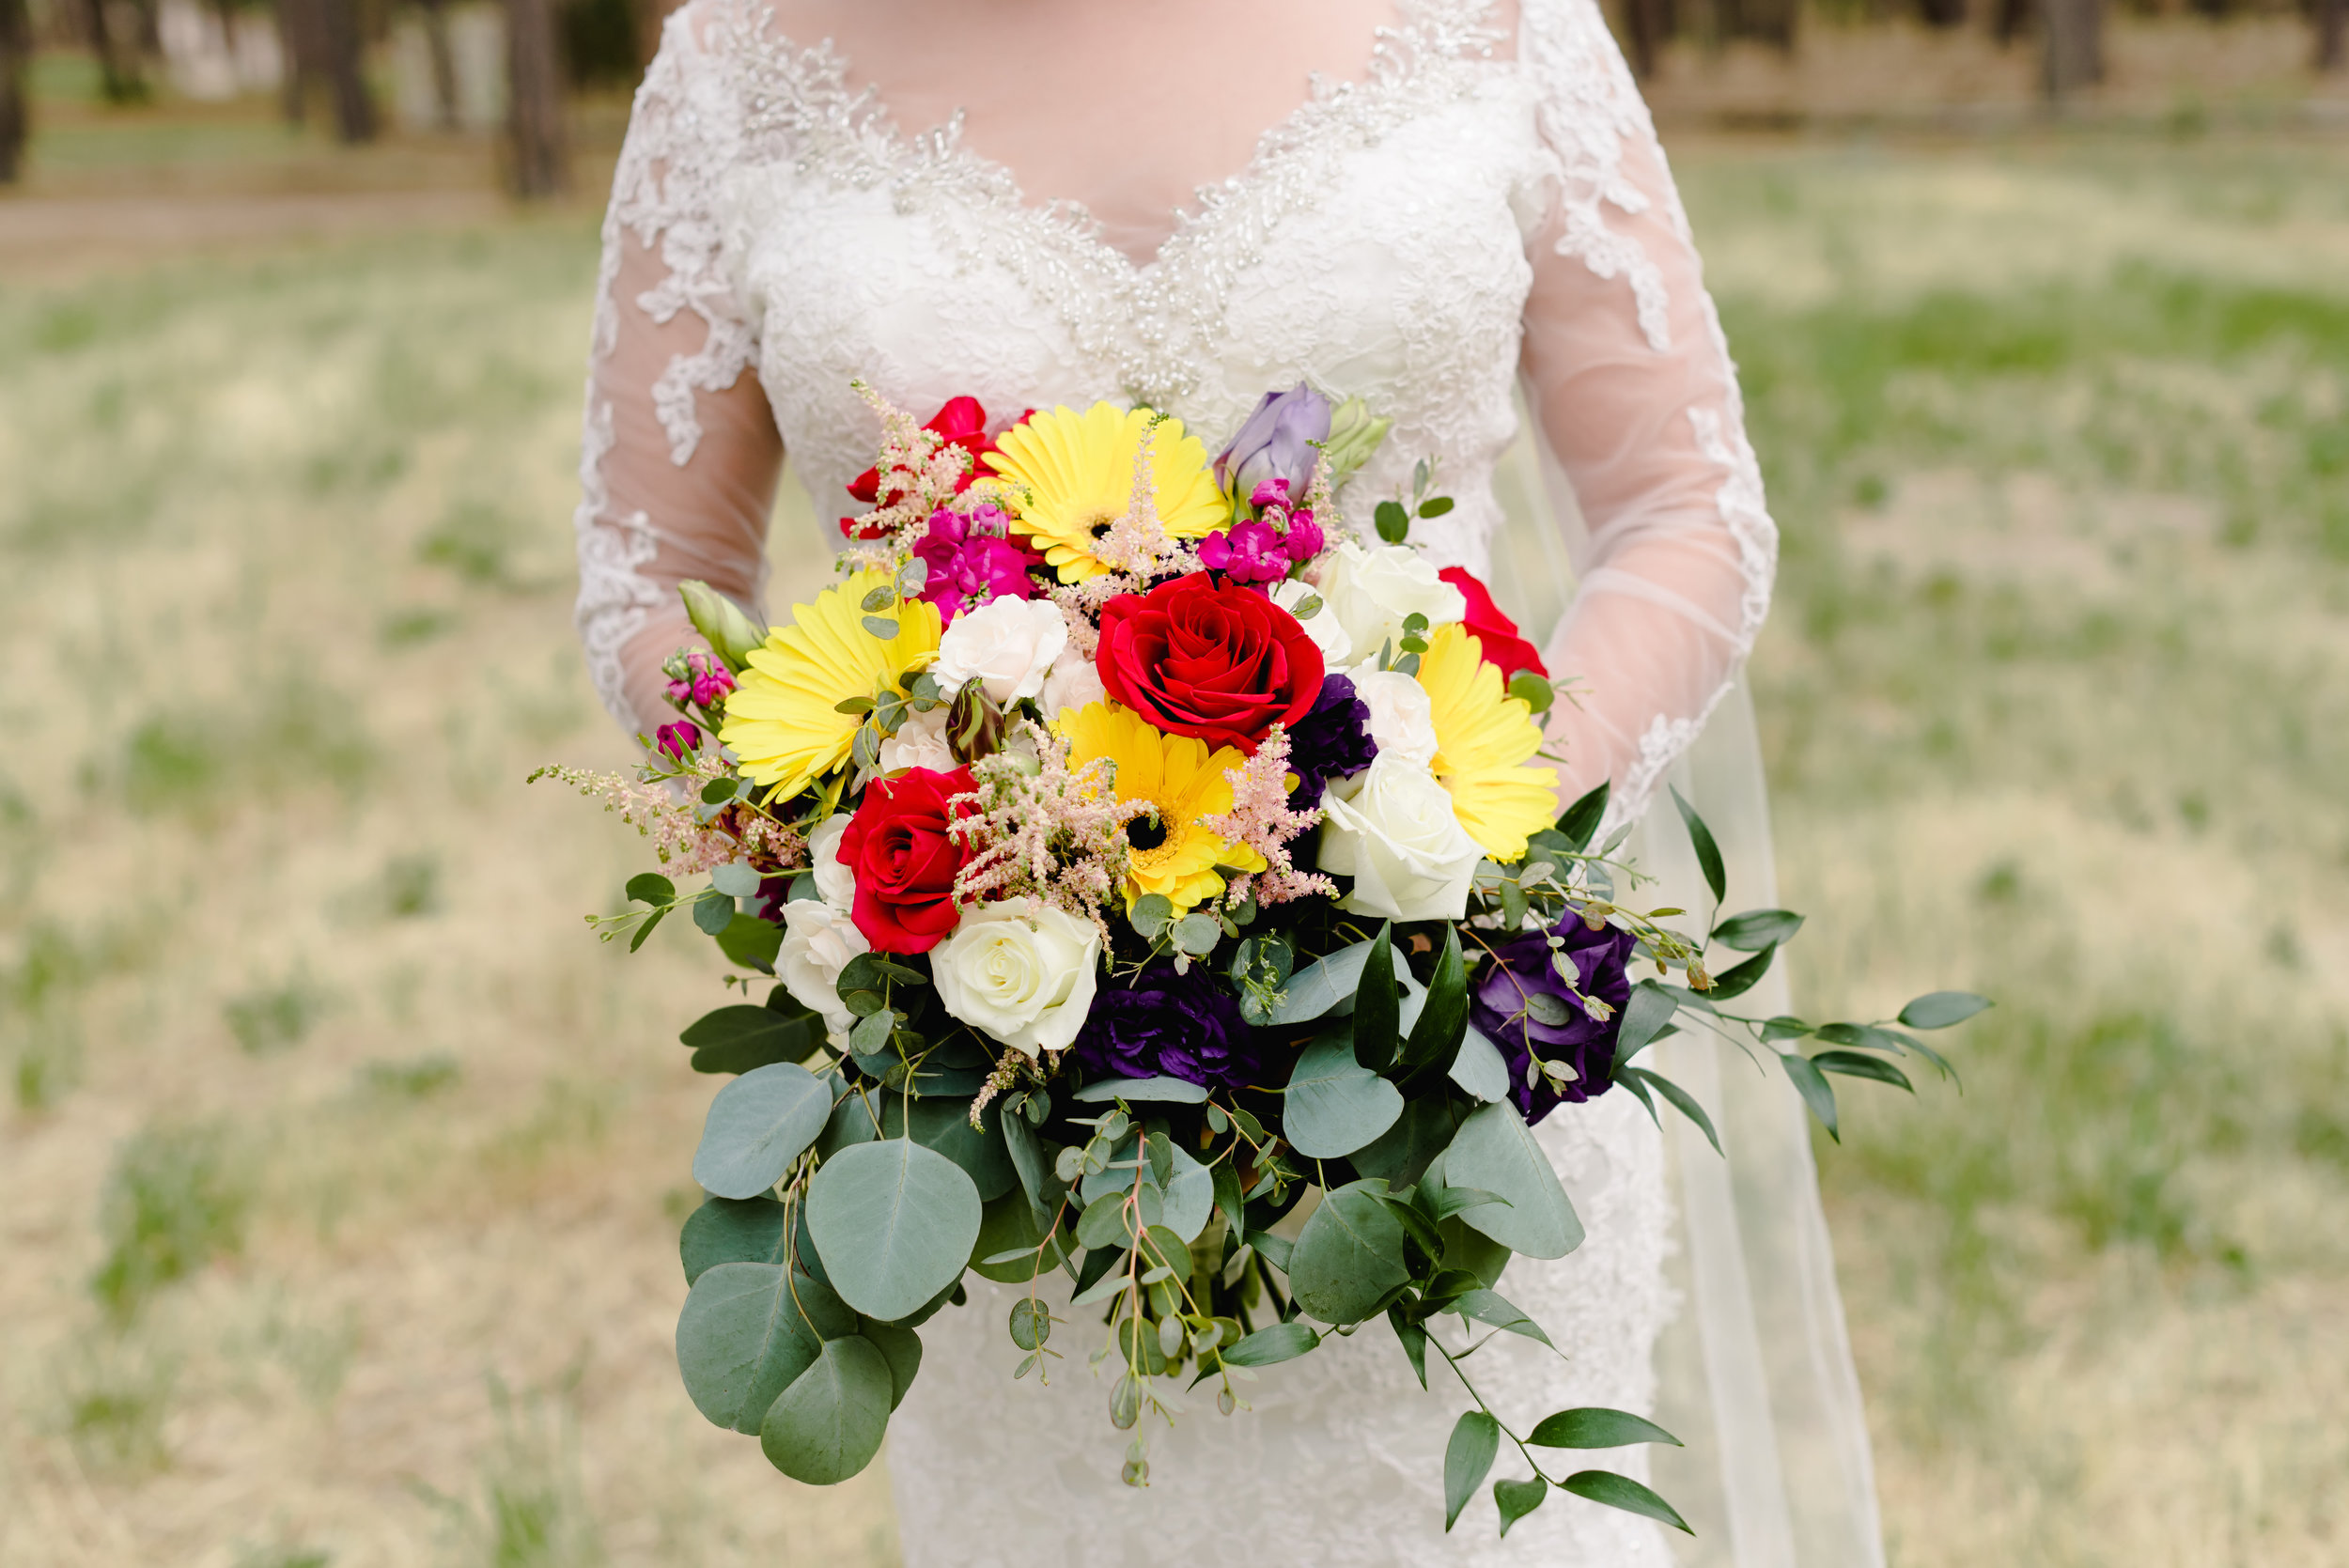 Laura Robinson Photography   www.laurarobinsonphoto.com